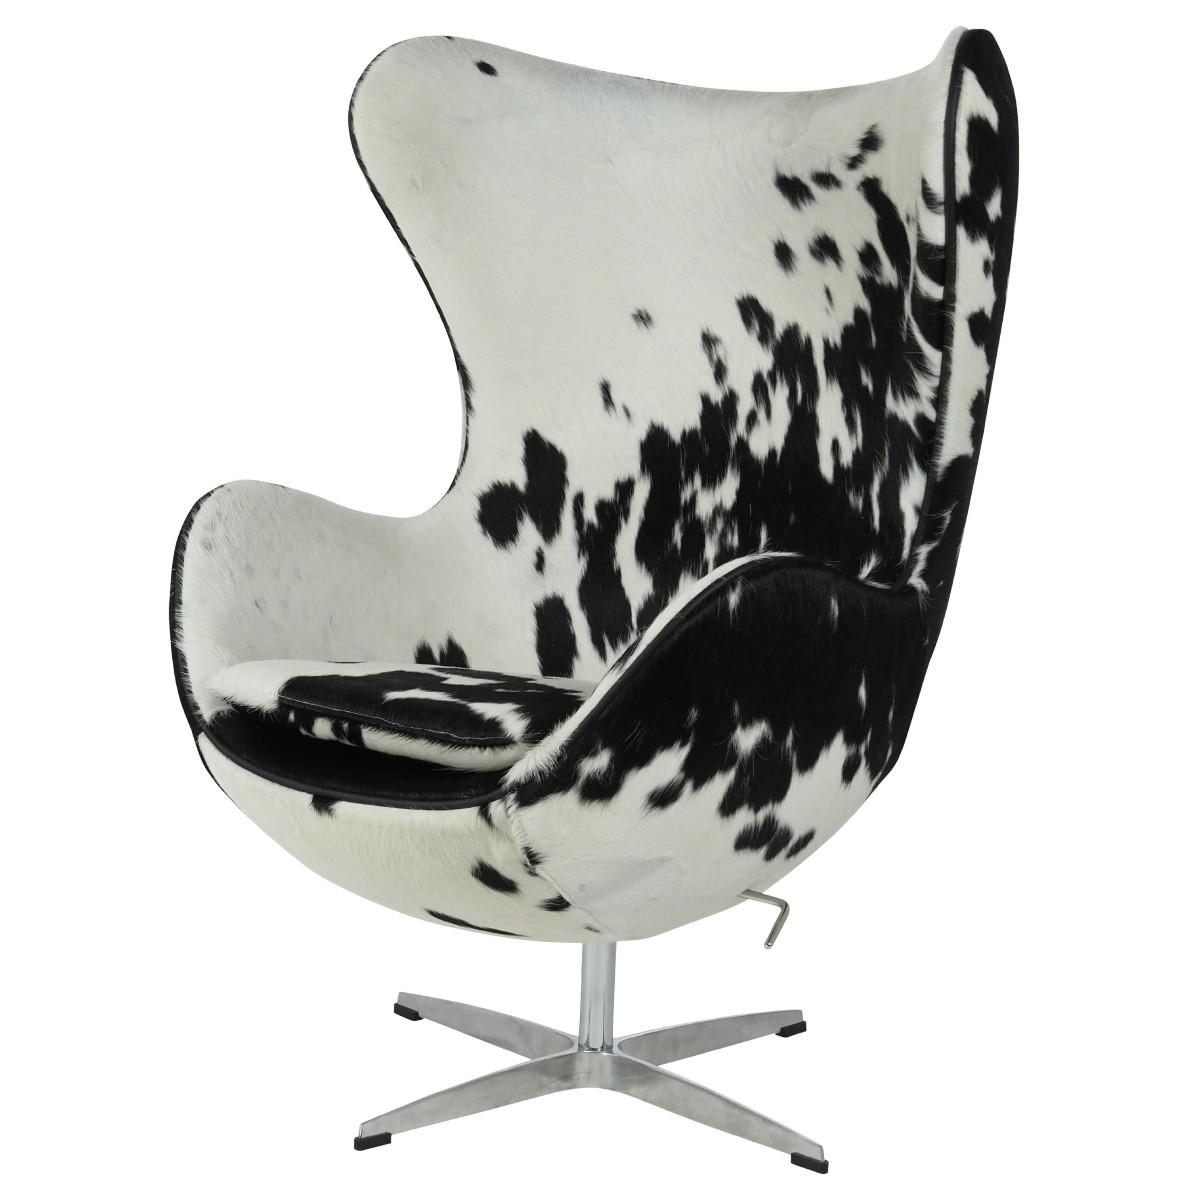 Lounge Stoel Wit.Lounge Stoel Egg Chair Zwart Wit